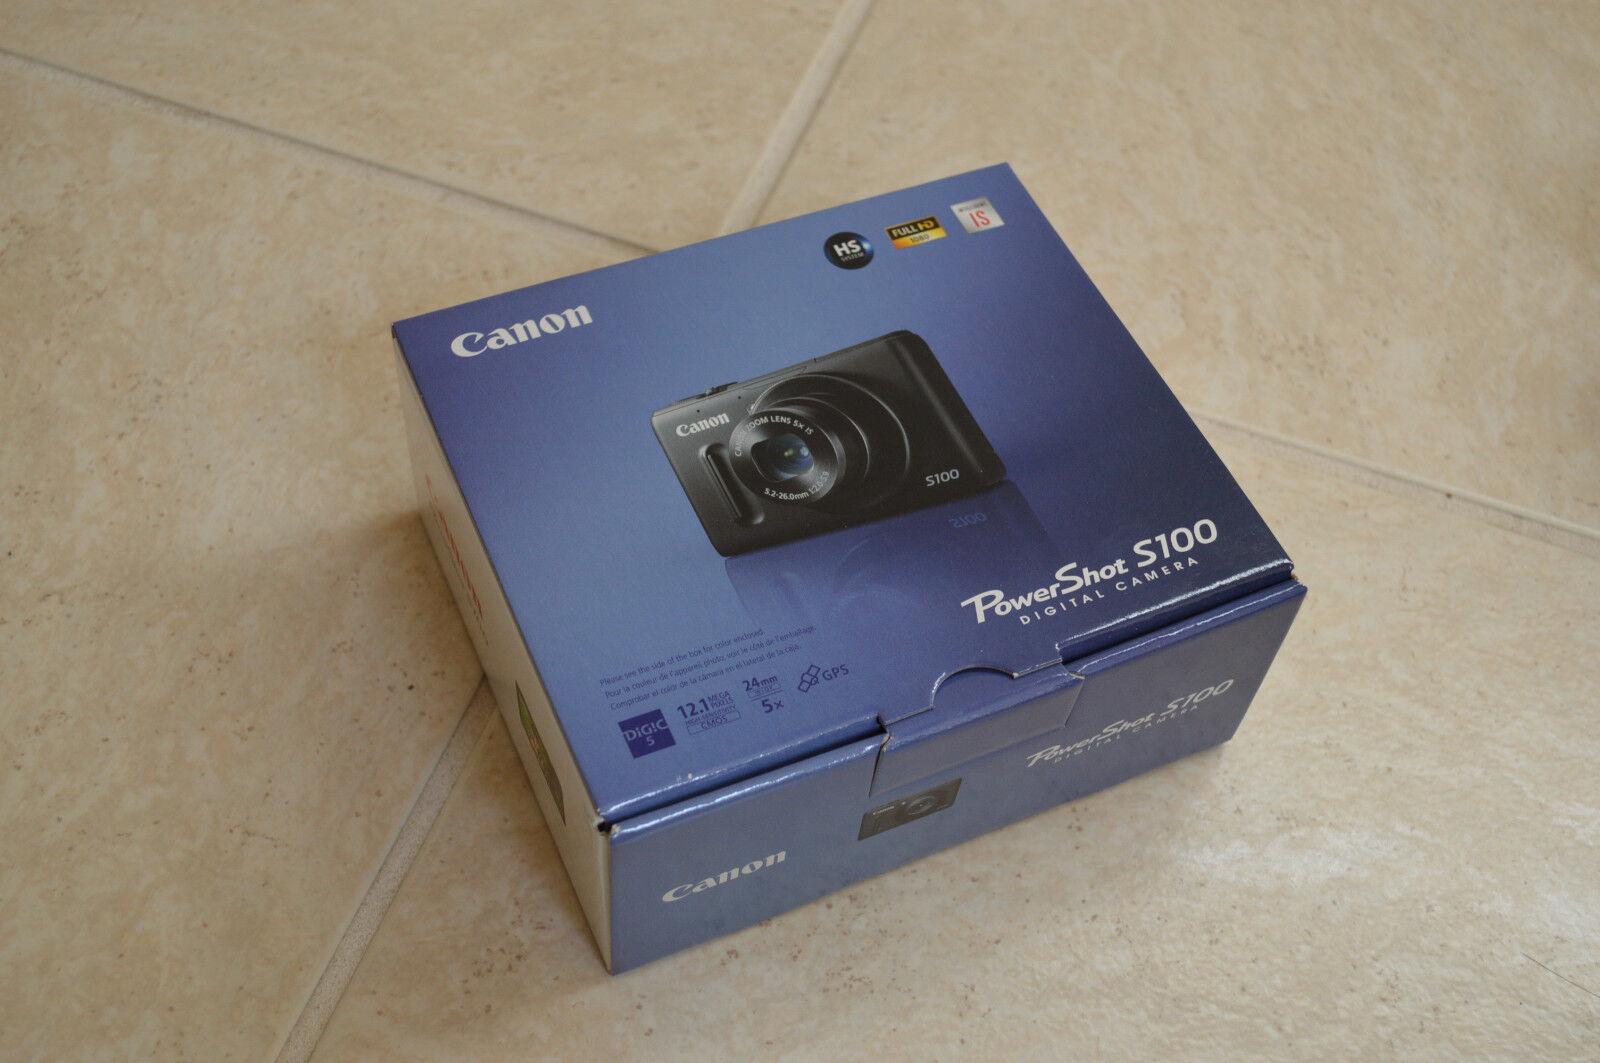 Canon PowerShot S100  from eBay